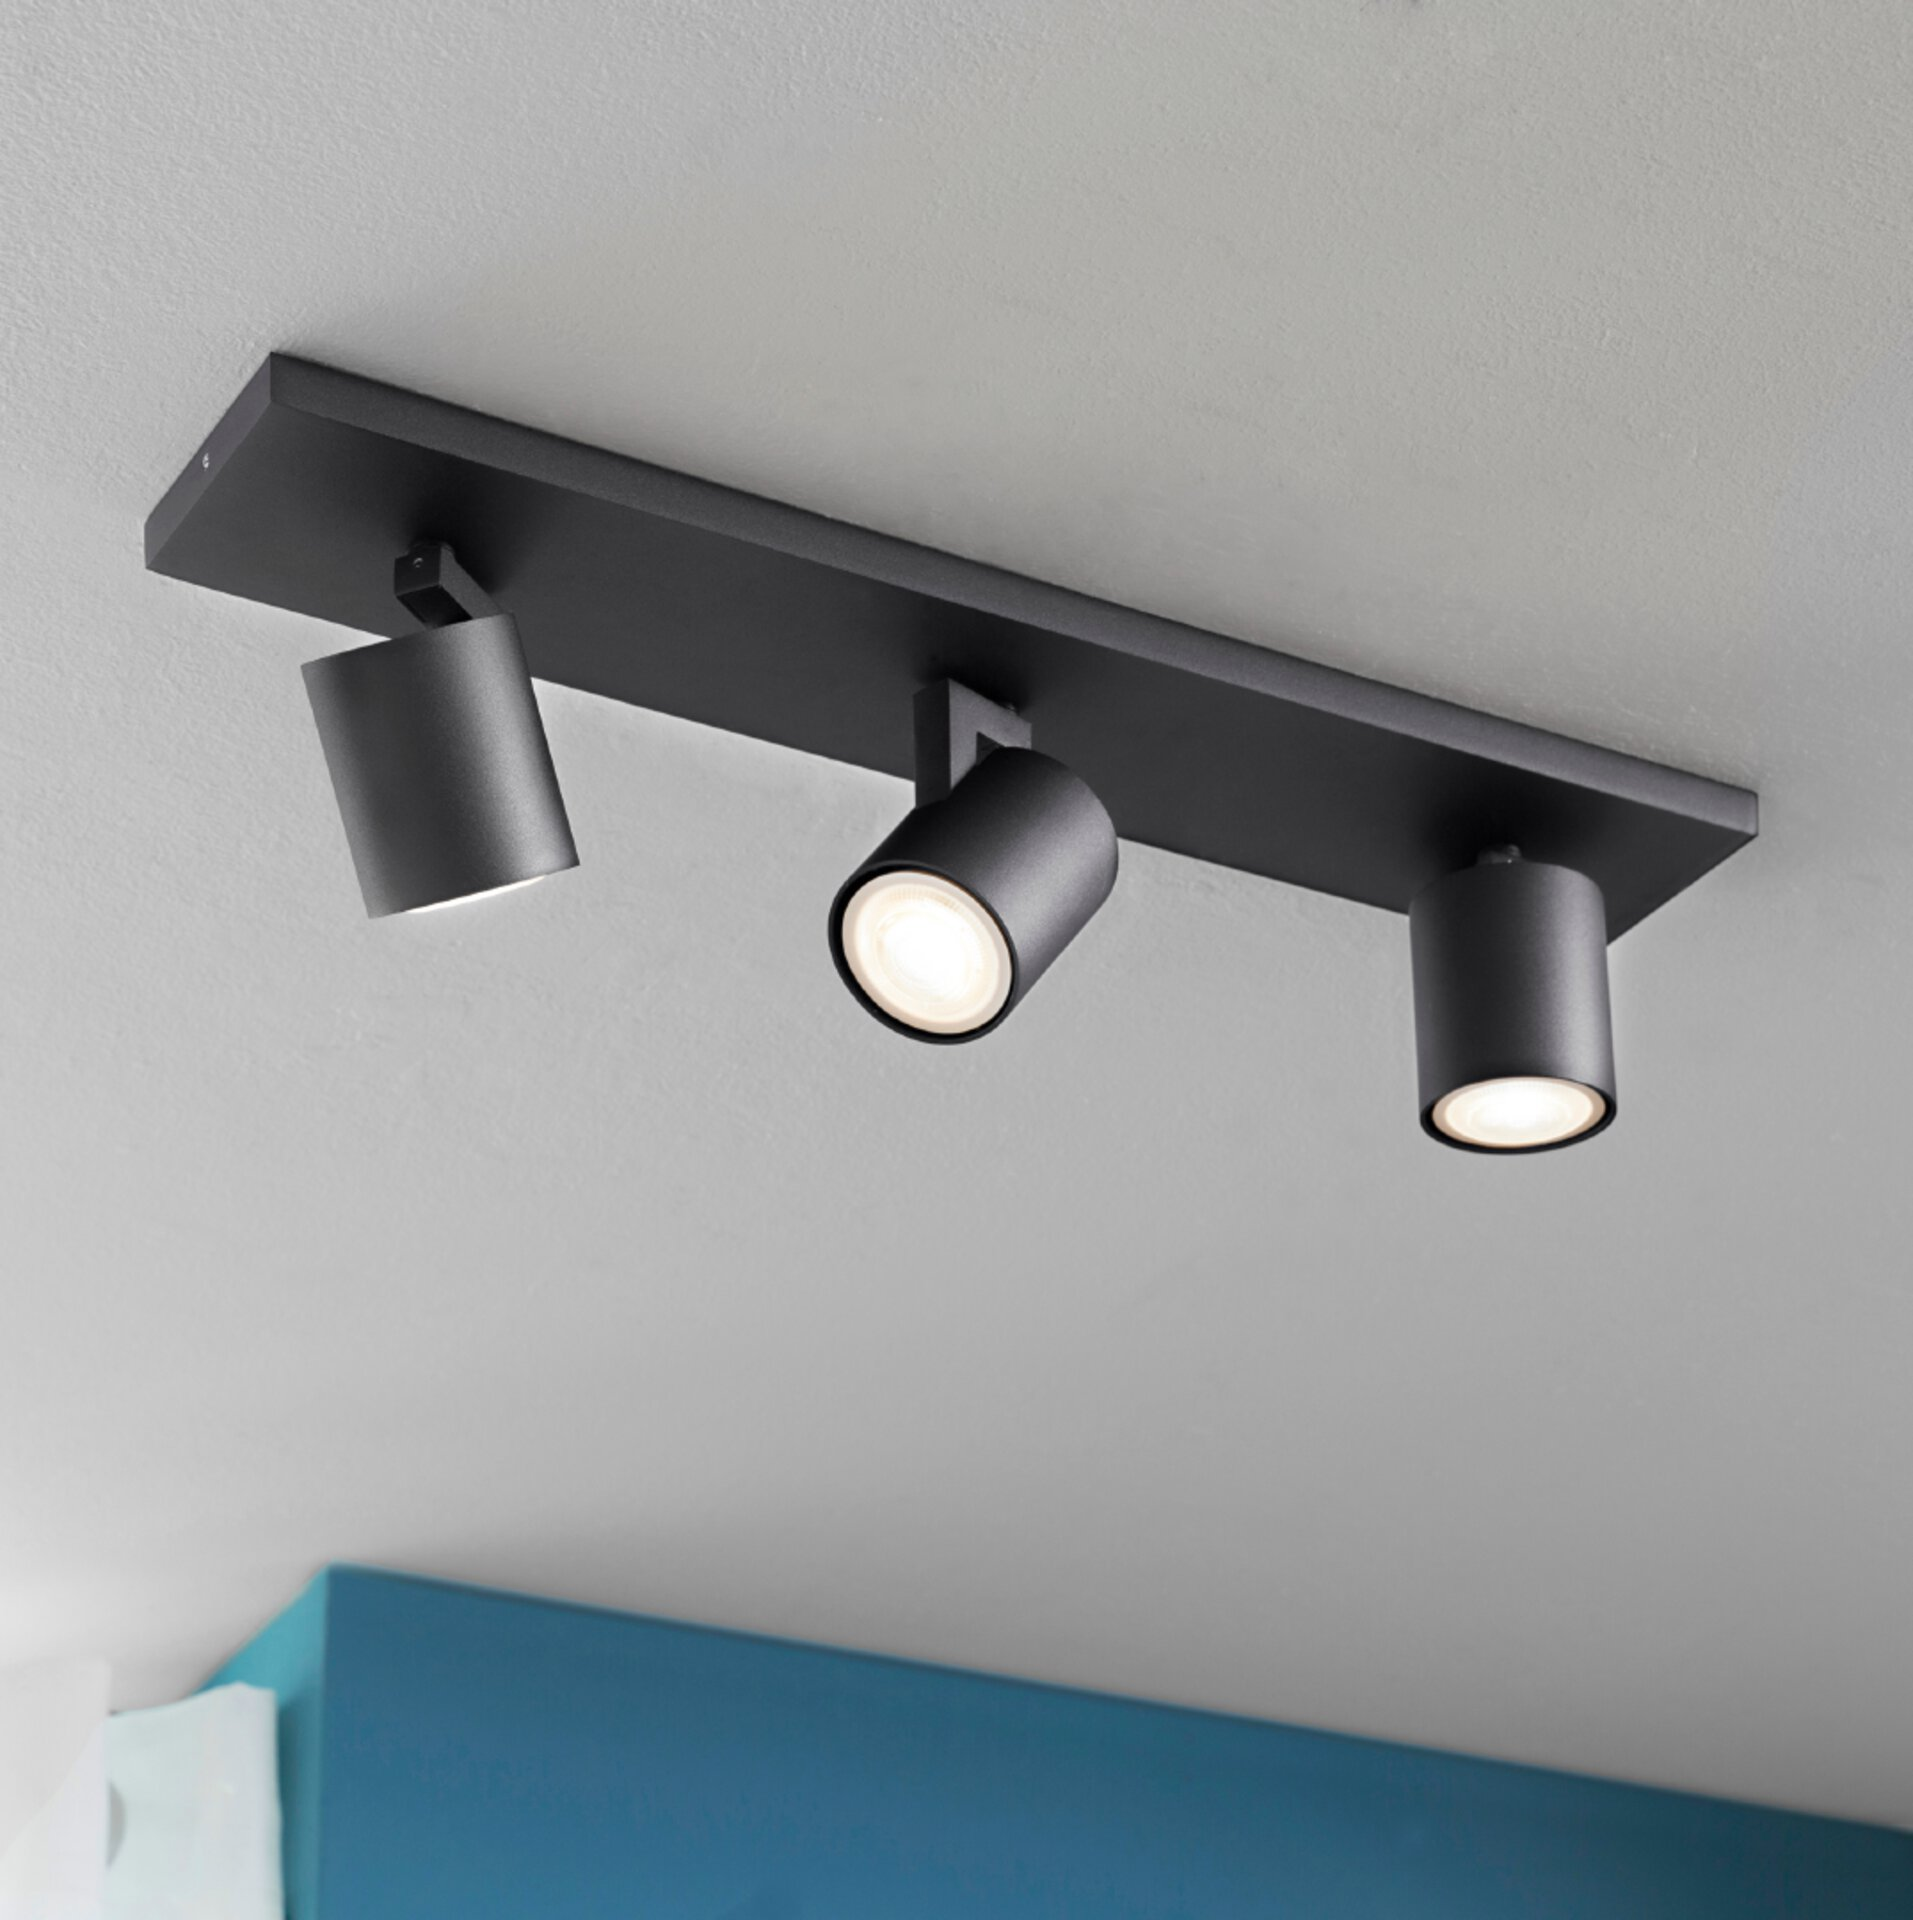 LED-Strahler von Philips, Alu